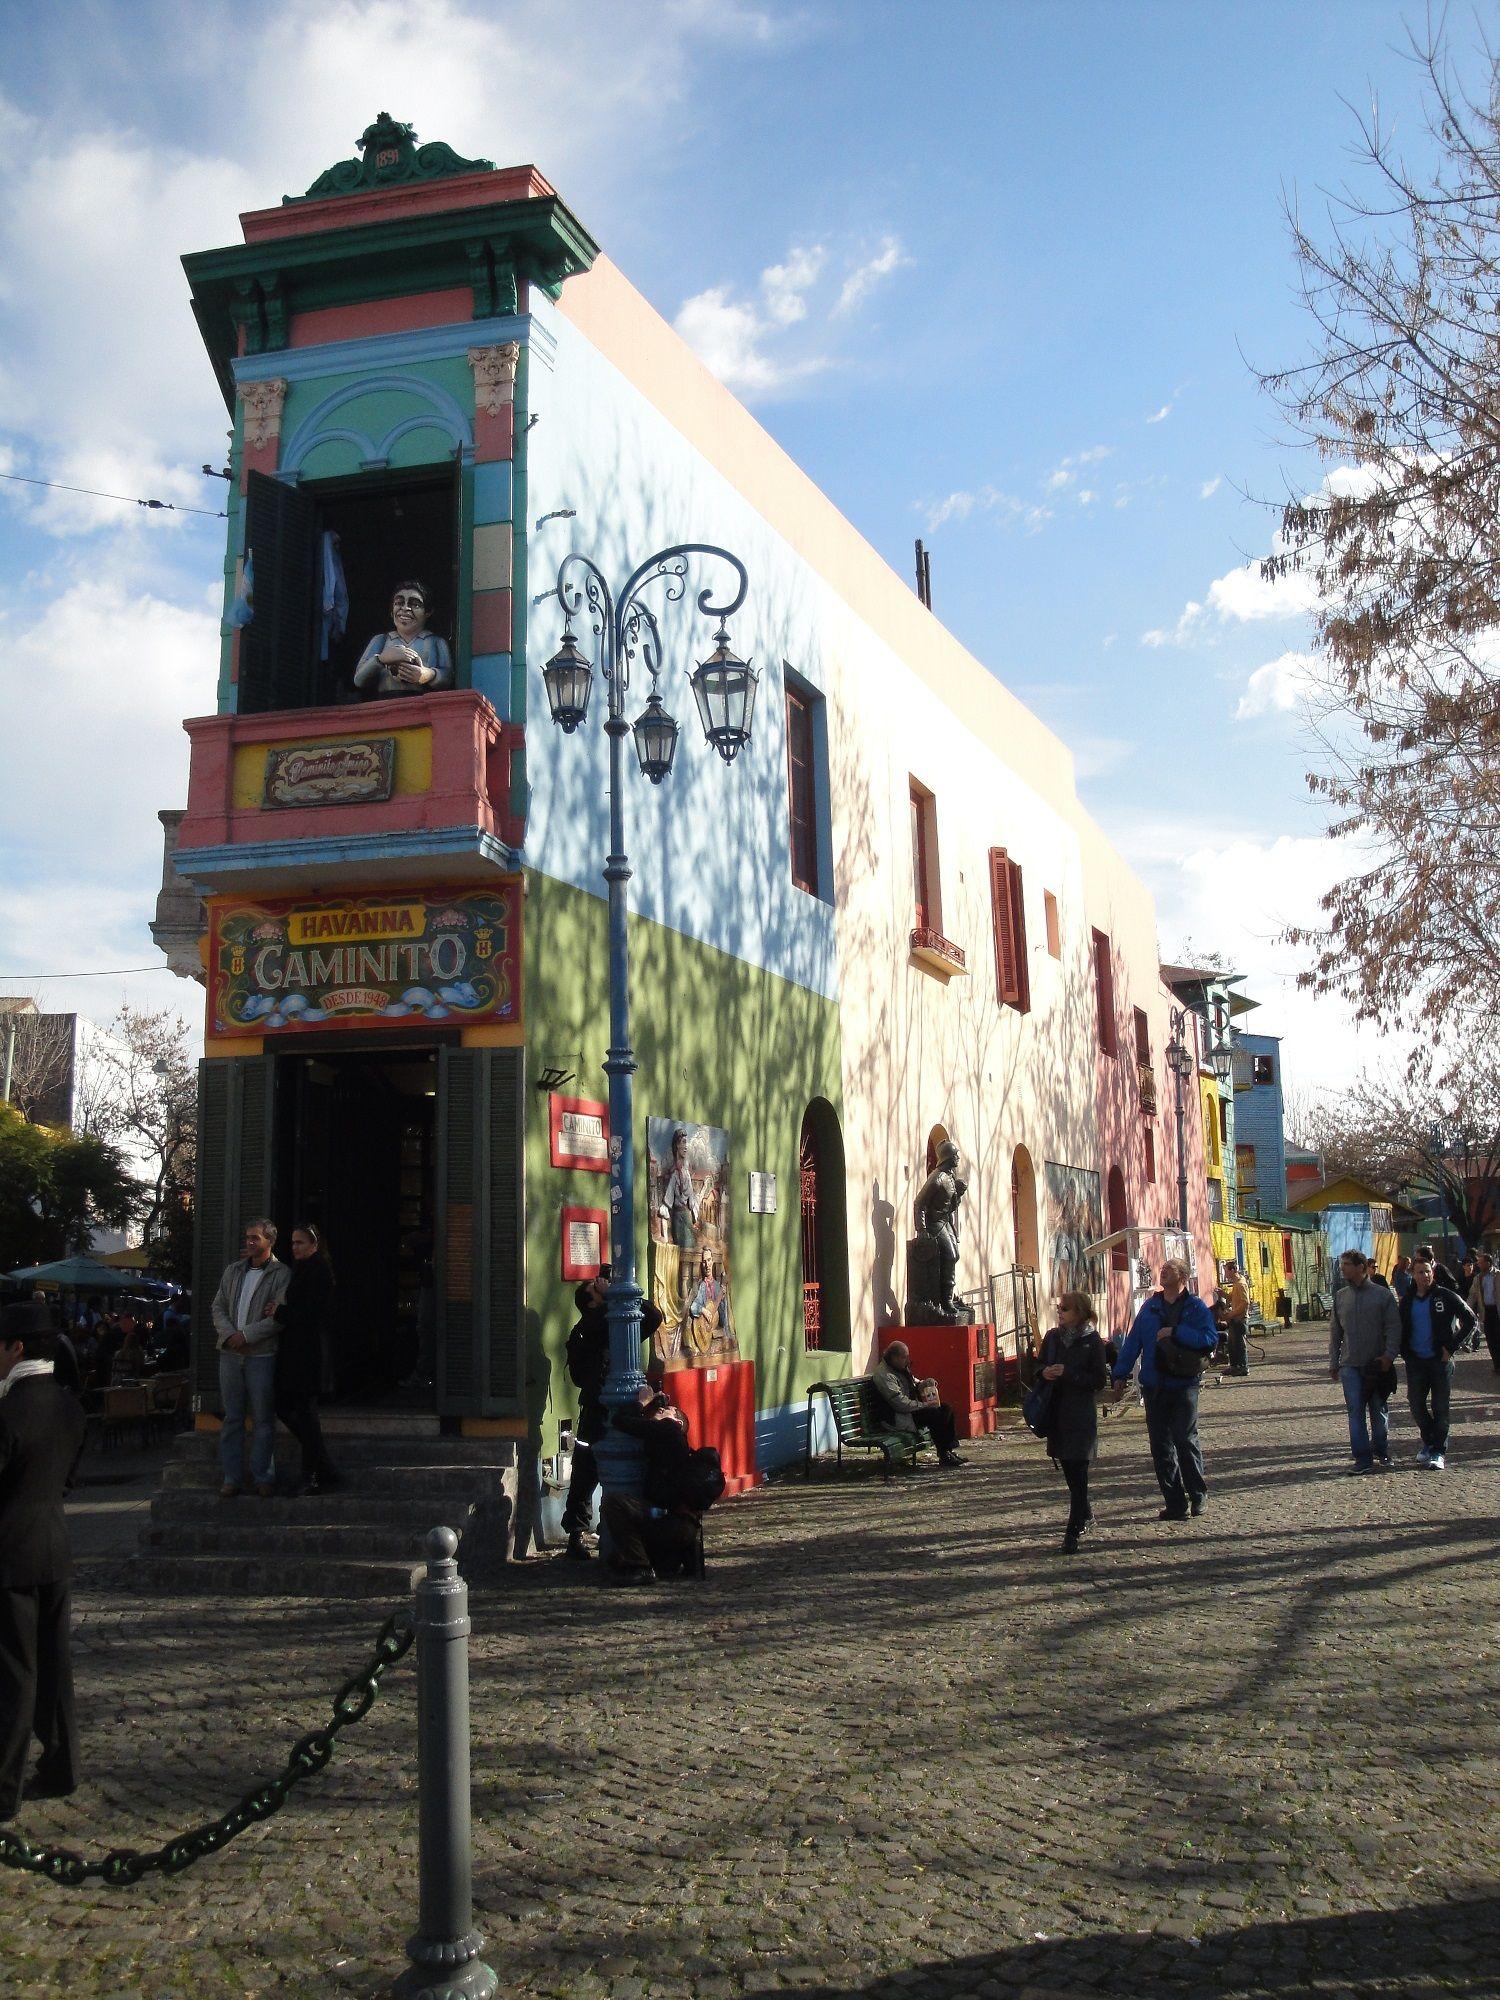 Caminito Buenos Aires.